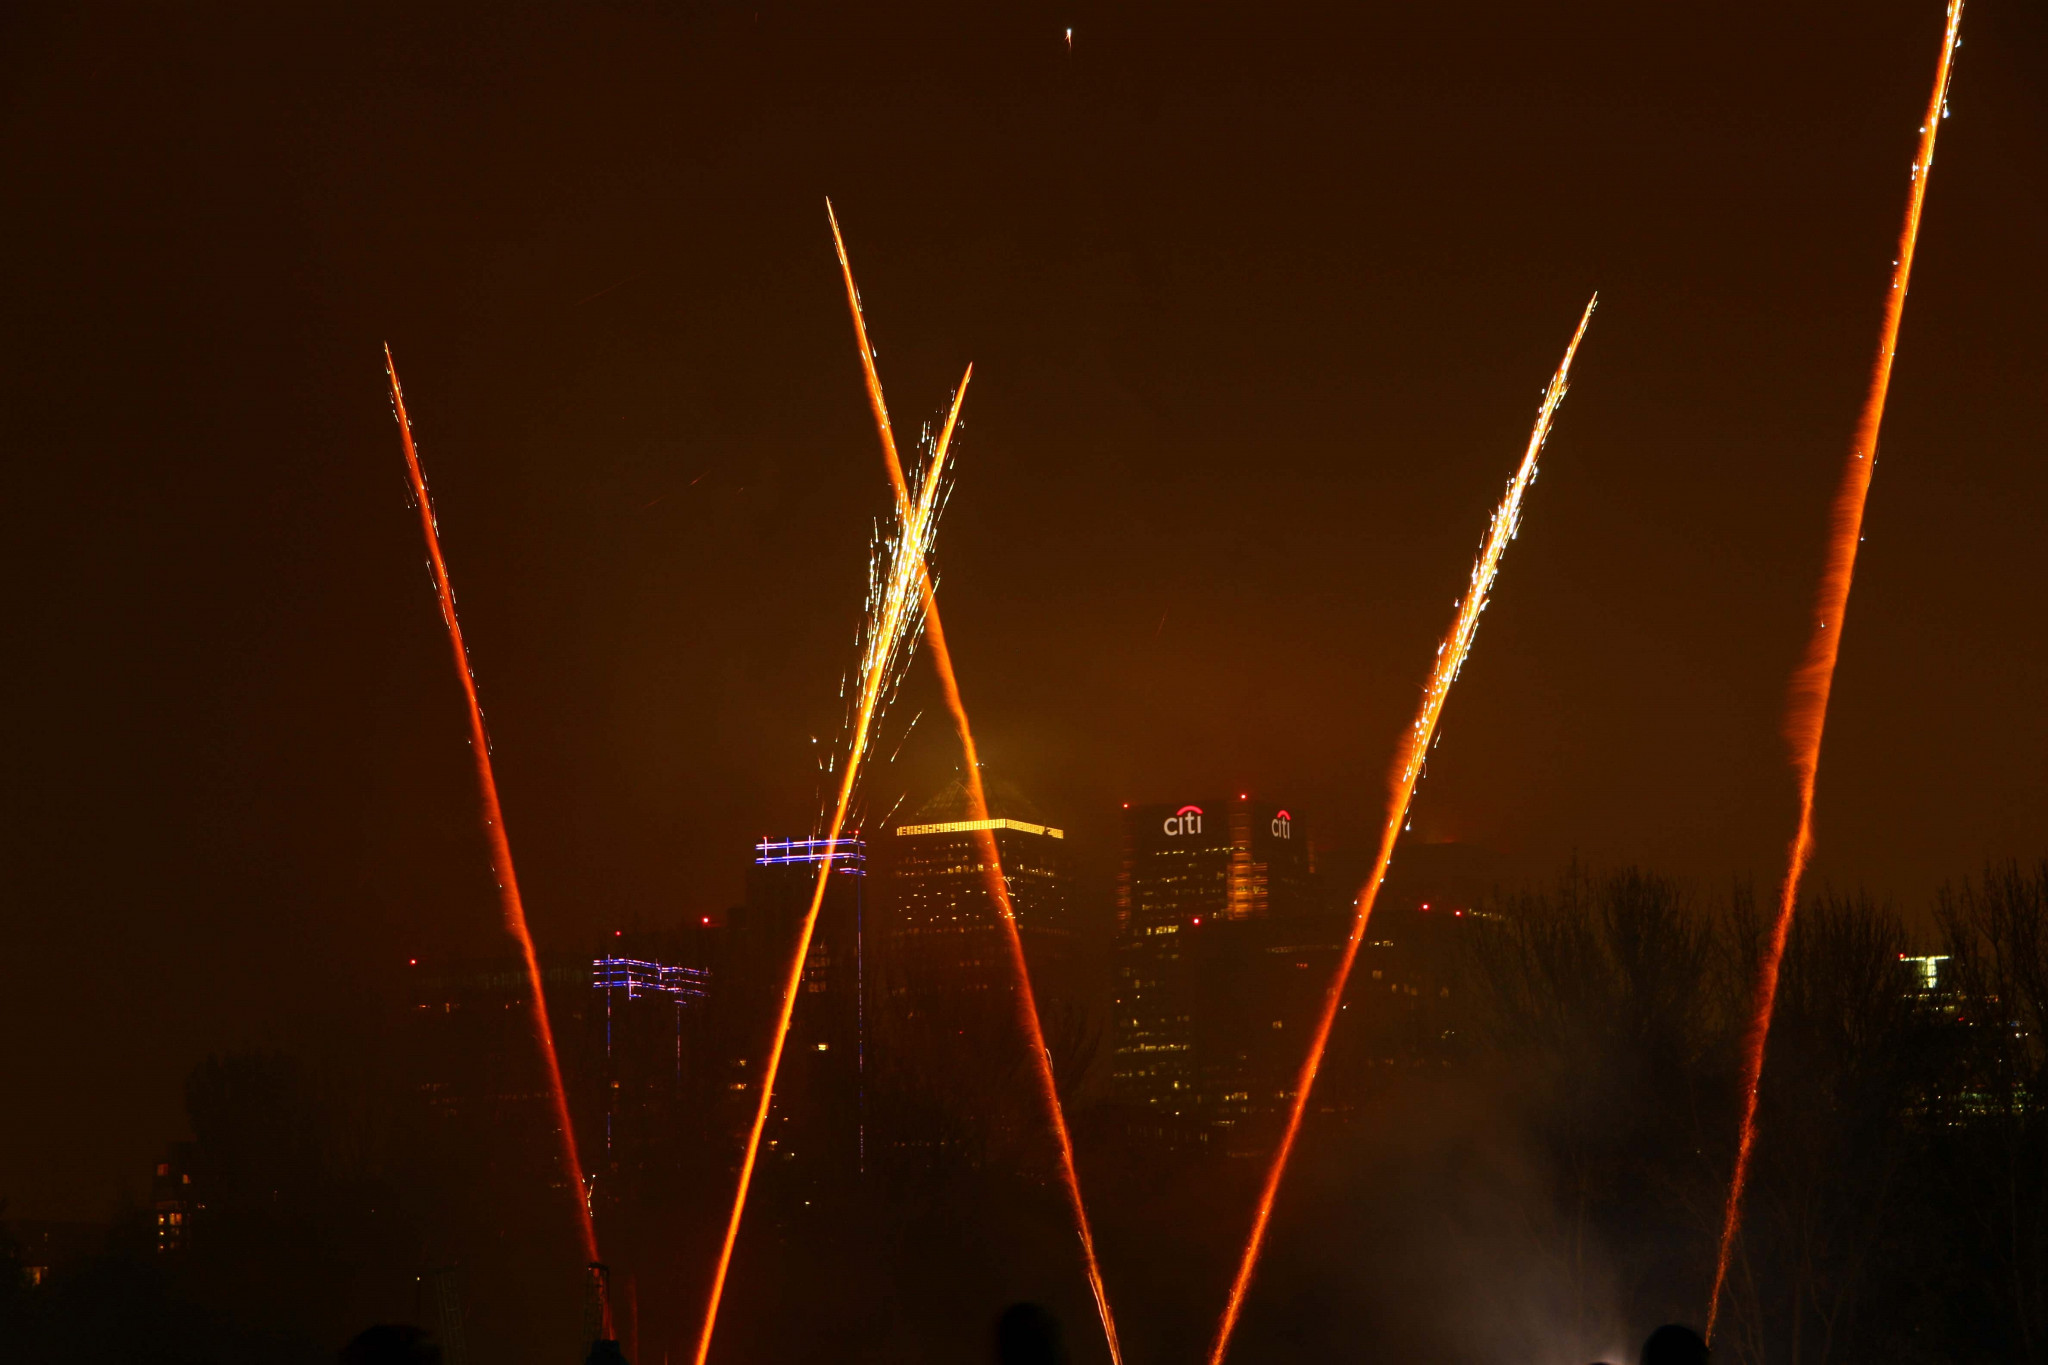 Fireworks on the Island